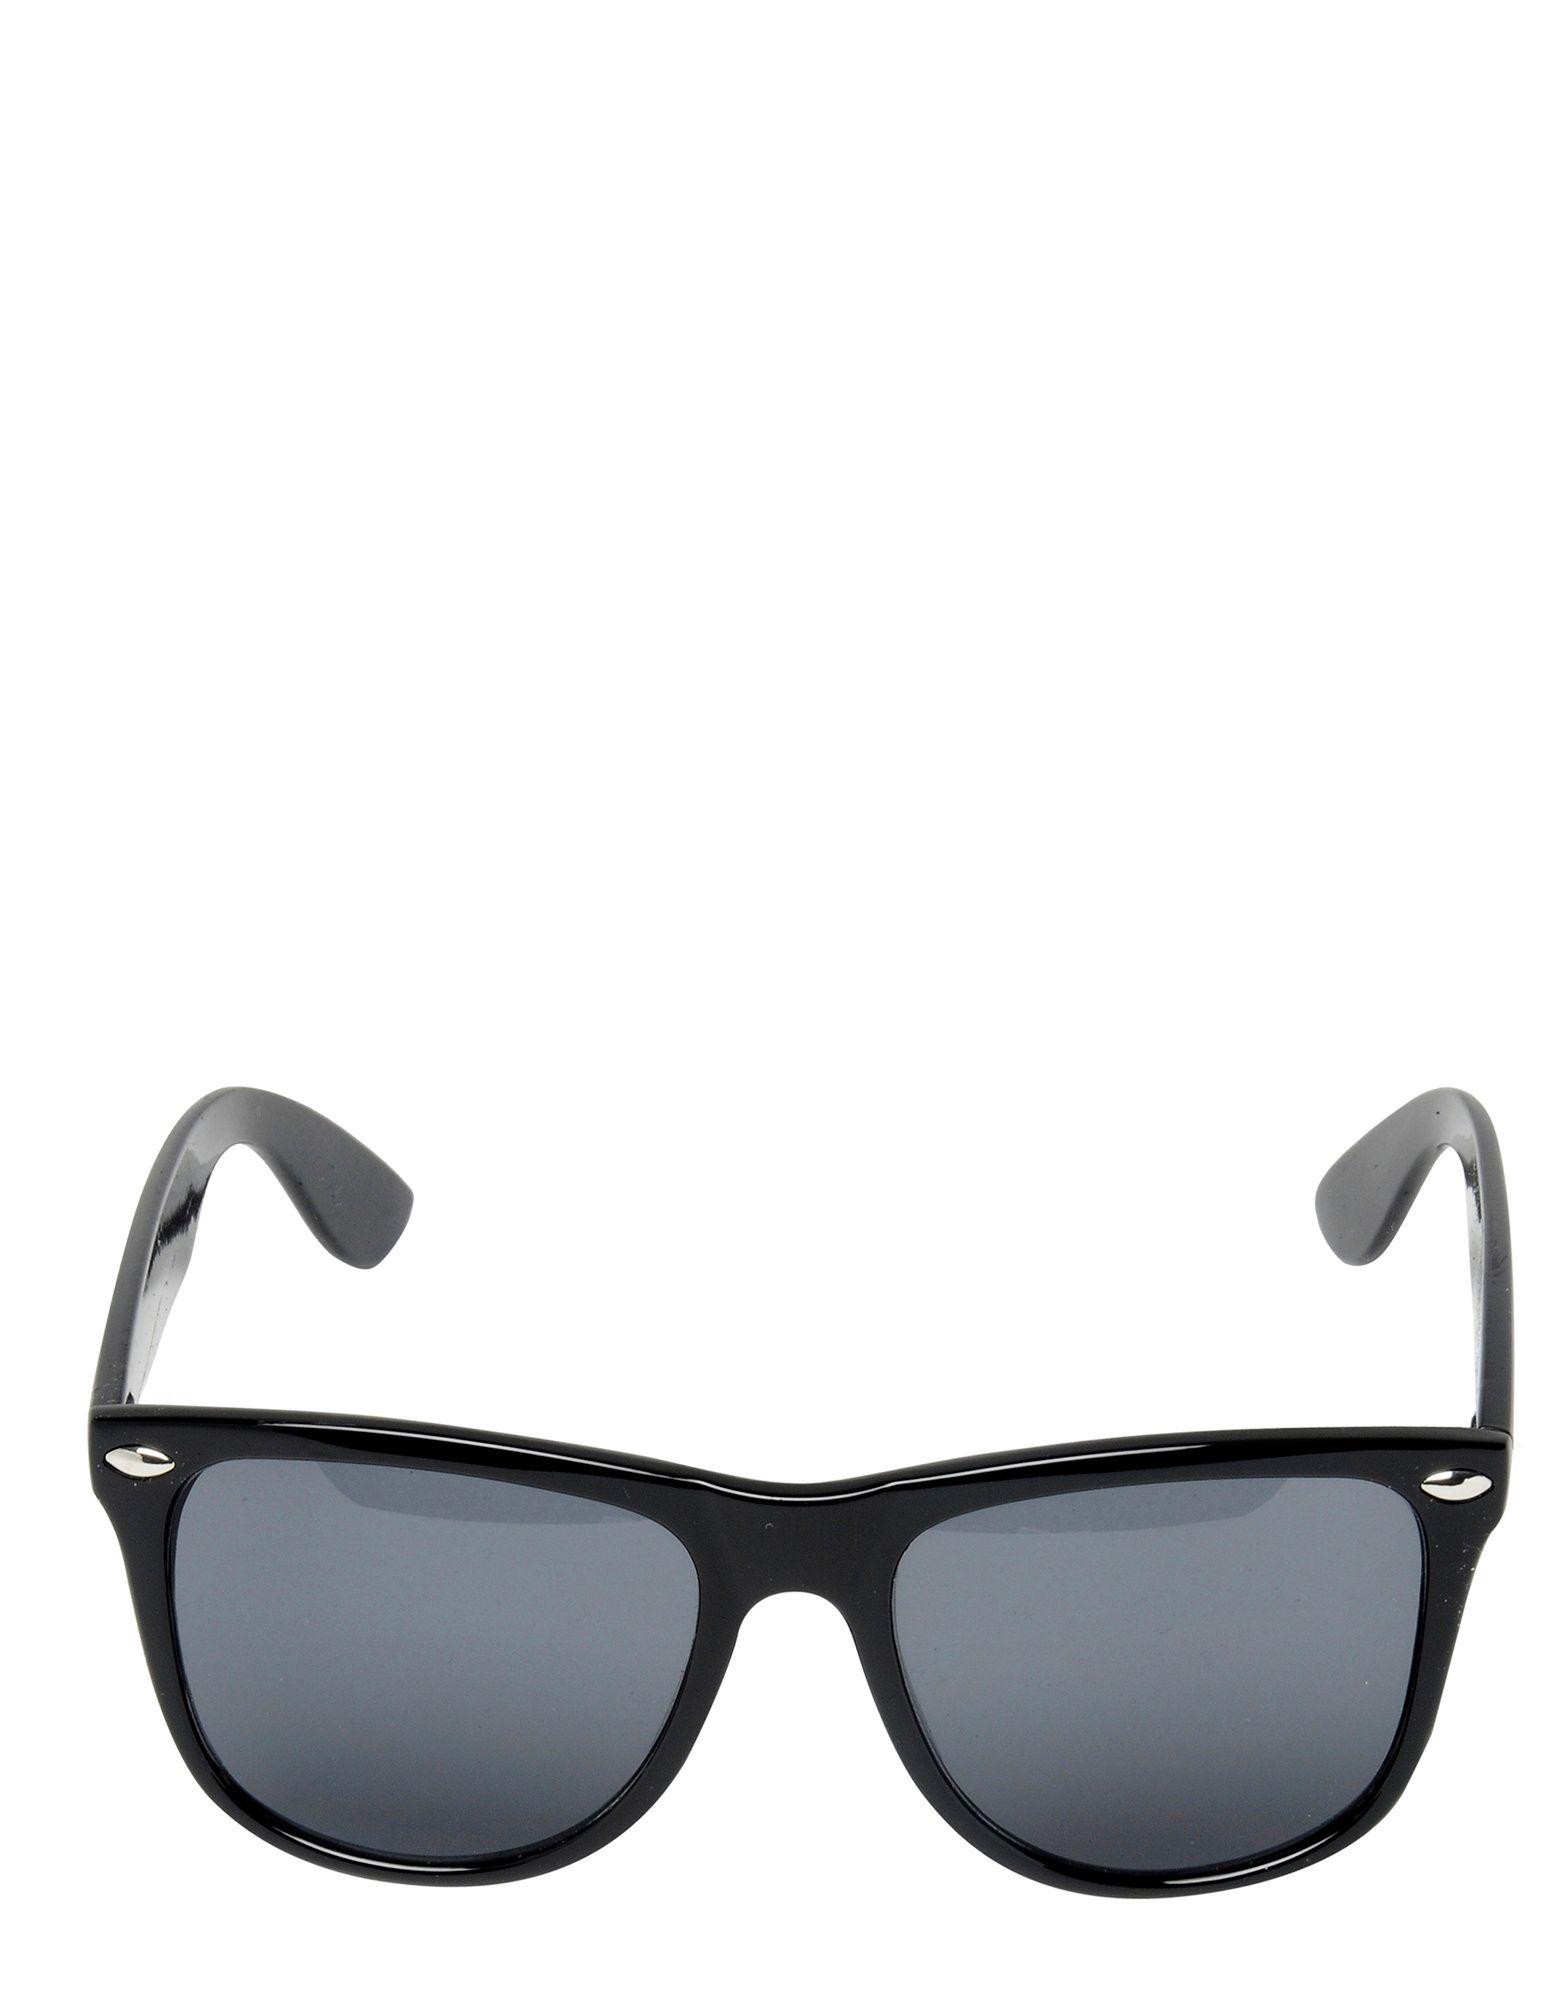 Brookhaven Sophia Wayfarer Style Sunglasses